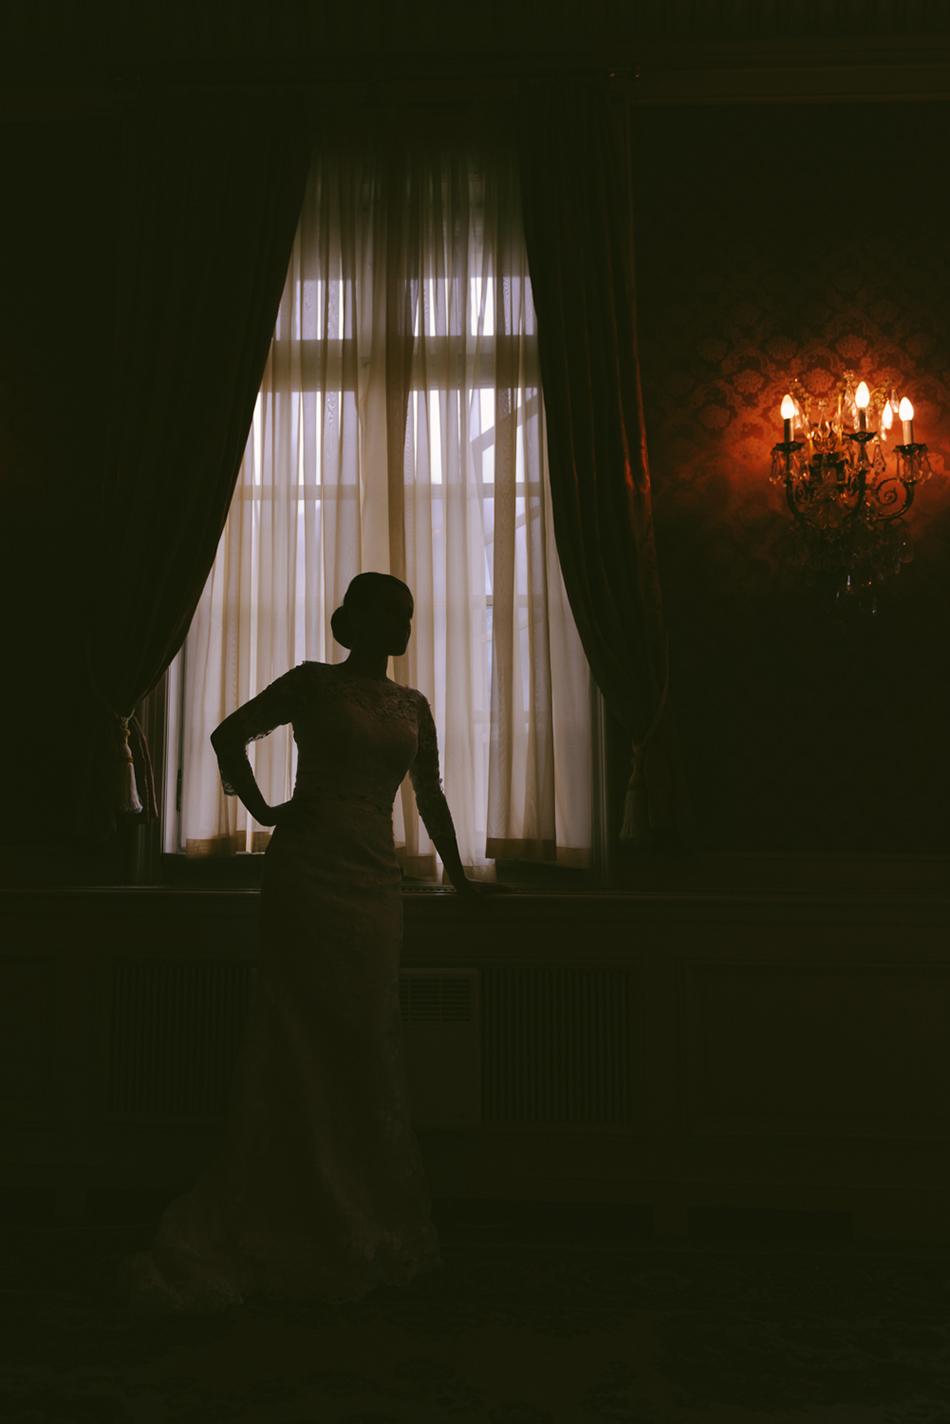 AD Passion Photography | fotograf-nunta-sinaia-flo-oana_0051a | Adelin, Dida, fotograf profesionist, fotograf de nunta, fotografie de nunta, fotograf Timisoara, fotograf Craiova, fotograf Bucuresti, fotograf Arad, nunta Timisoara, nunta Arad, nunta Bucuresti, nunta Craiova